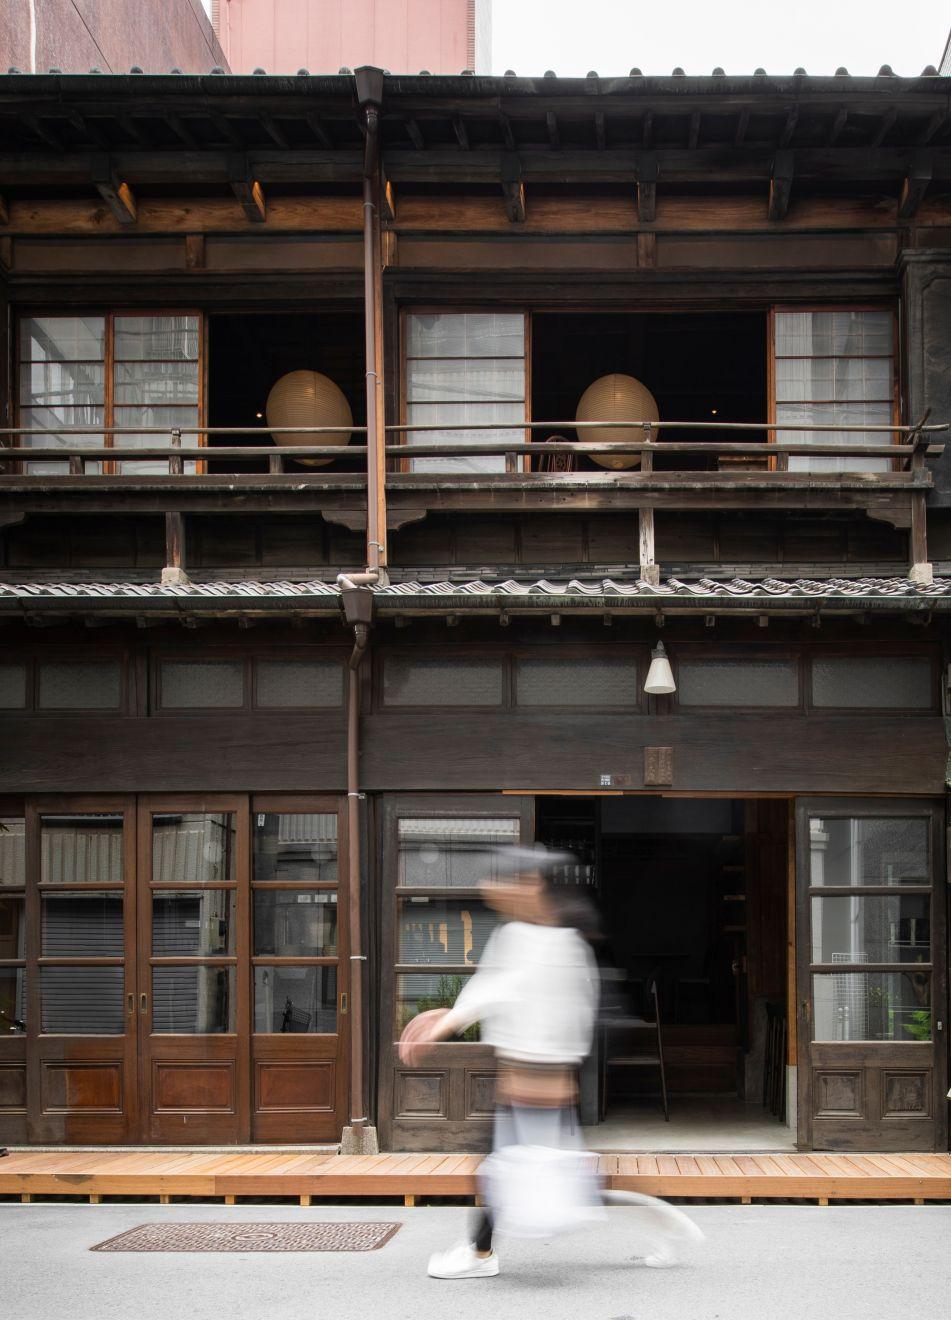 Kufuku Restaurant, Ariake, LES VRAIS